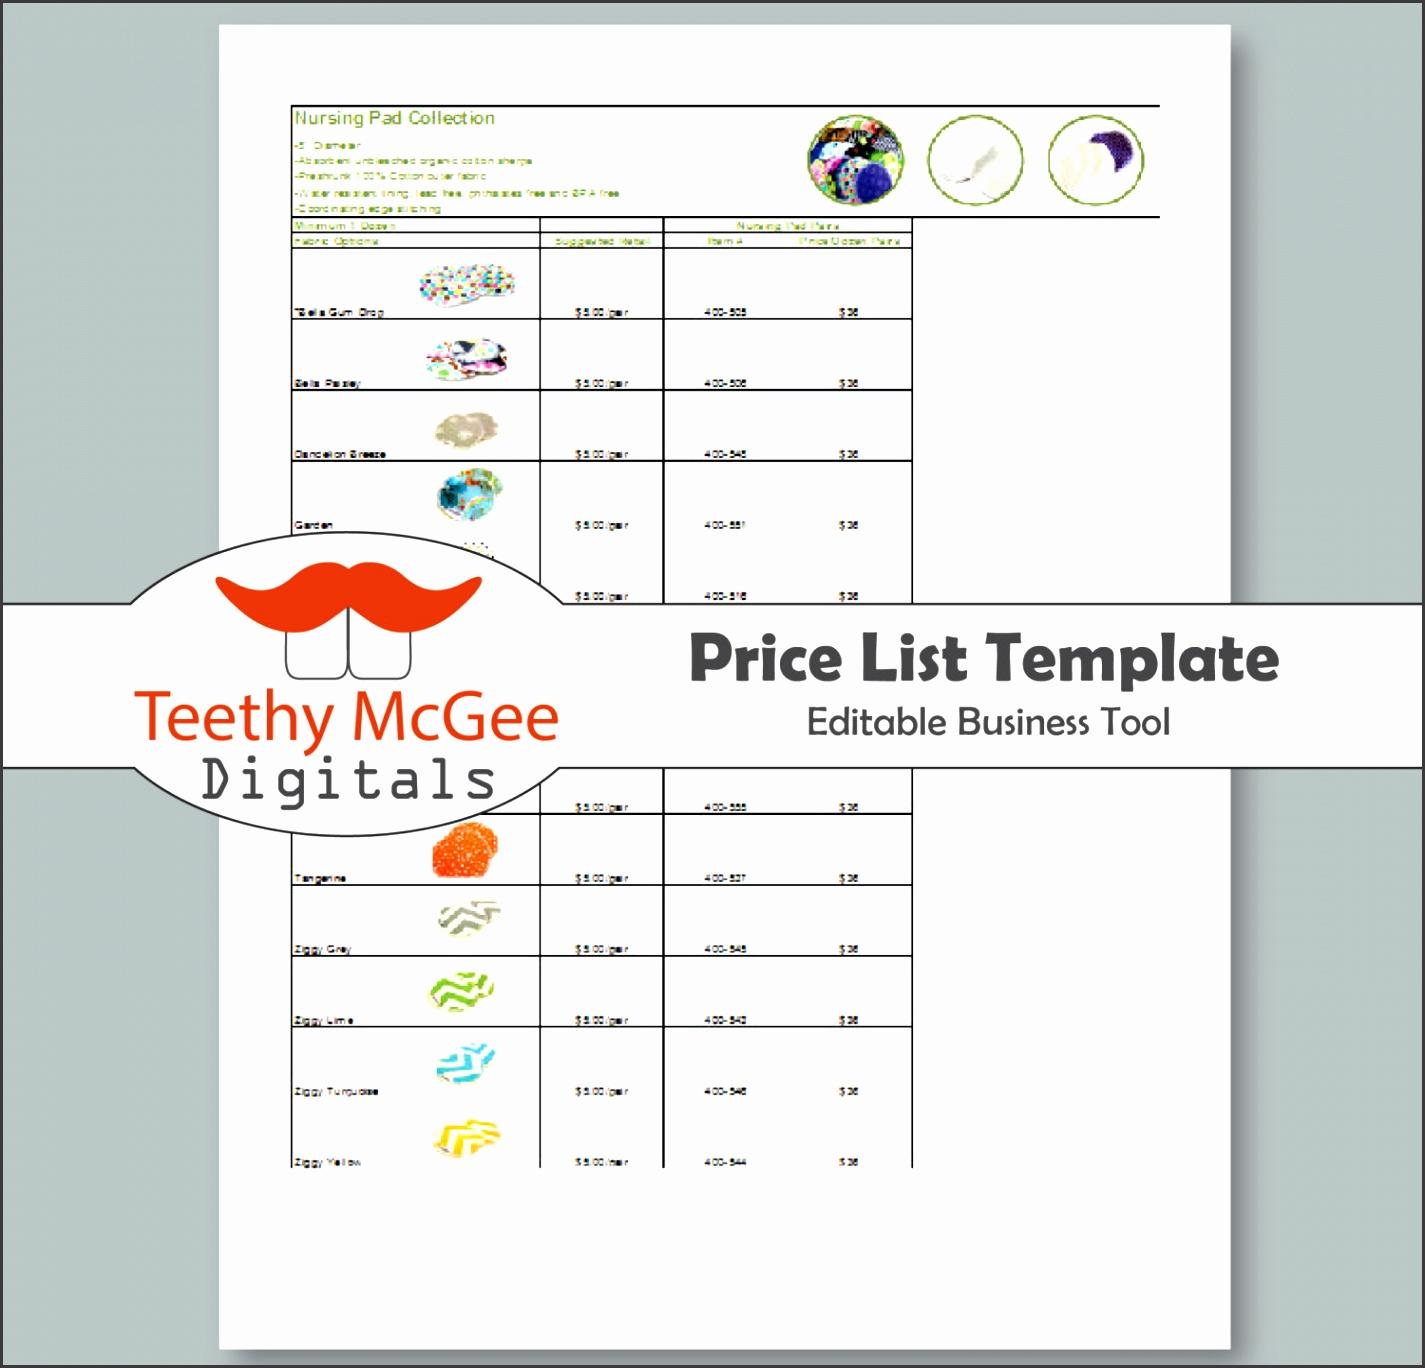 price list image 4